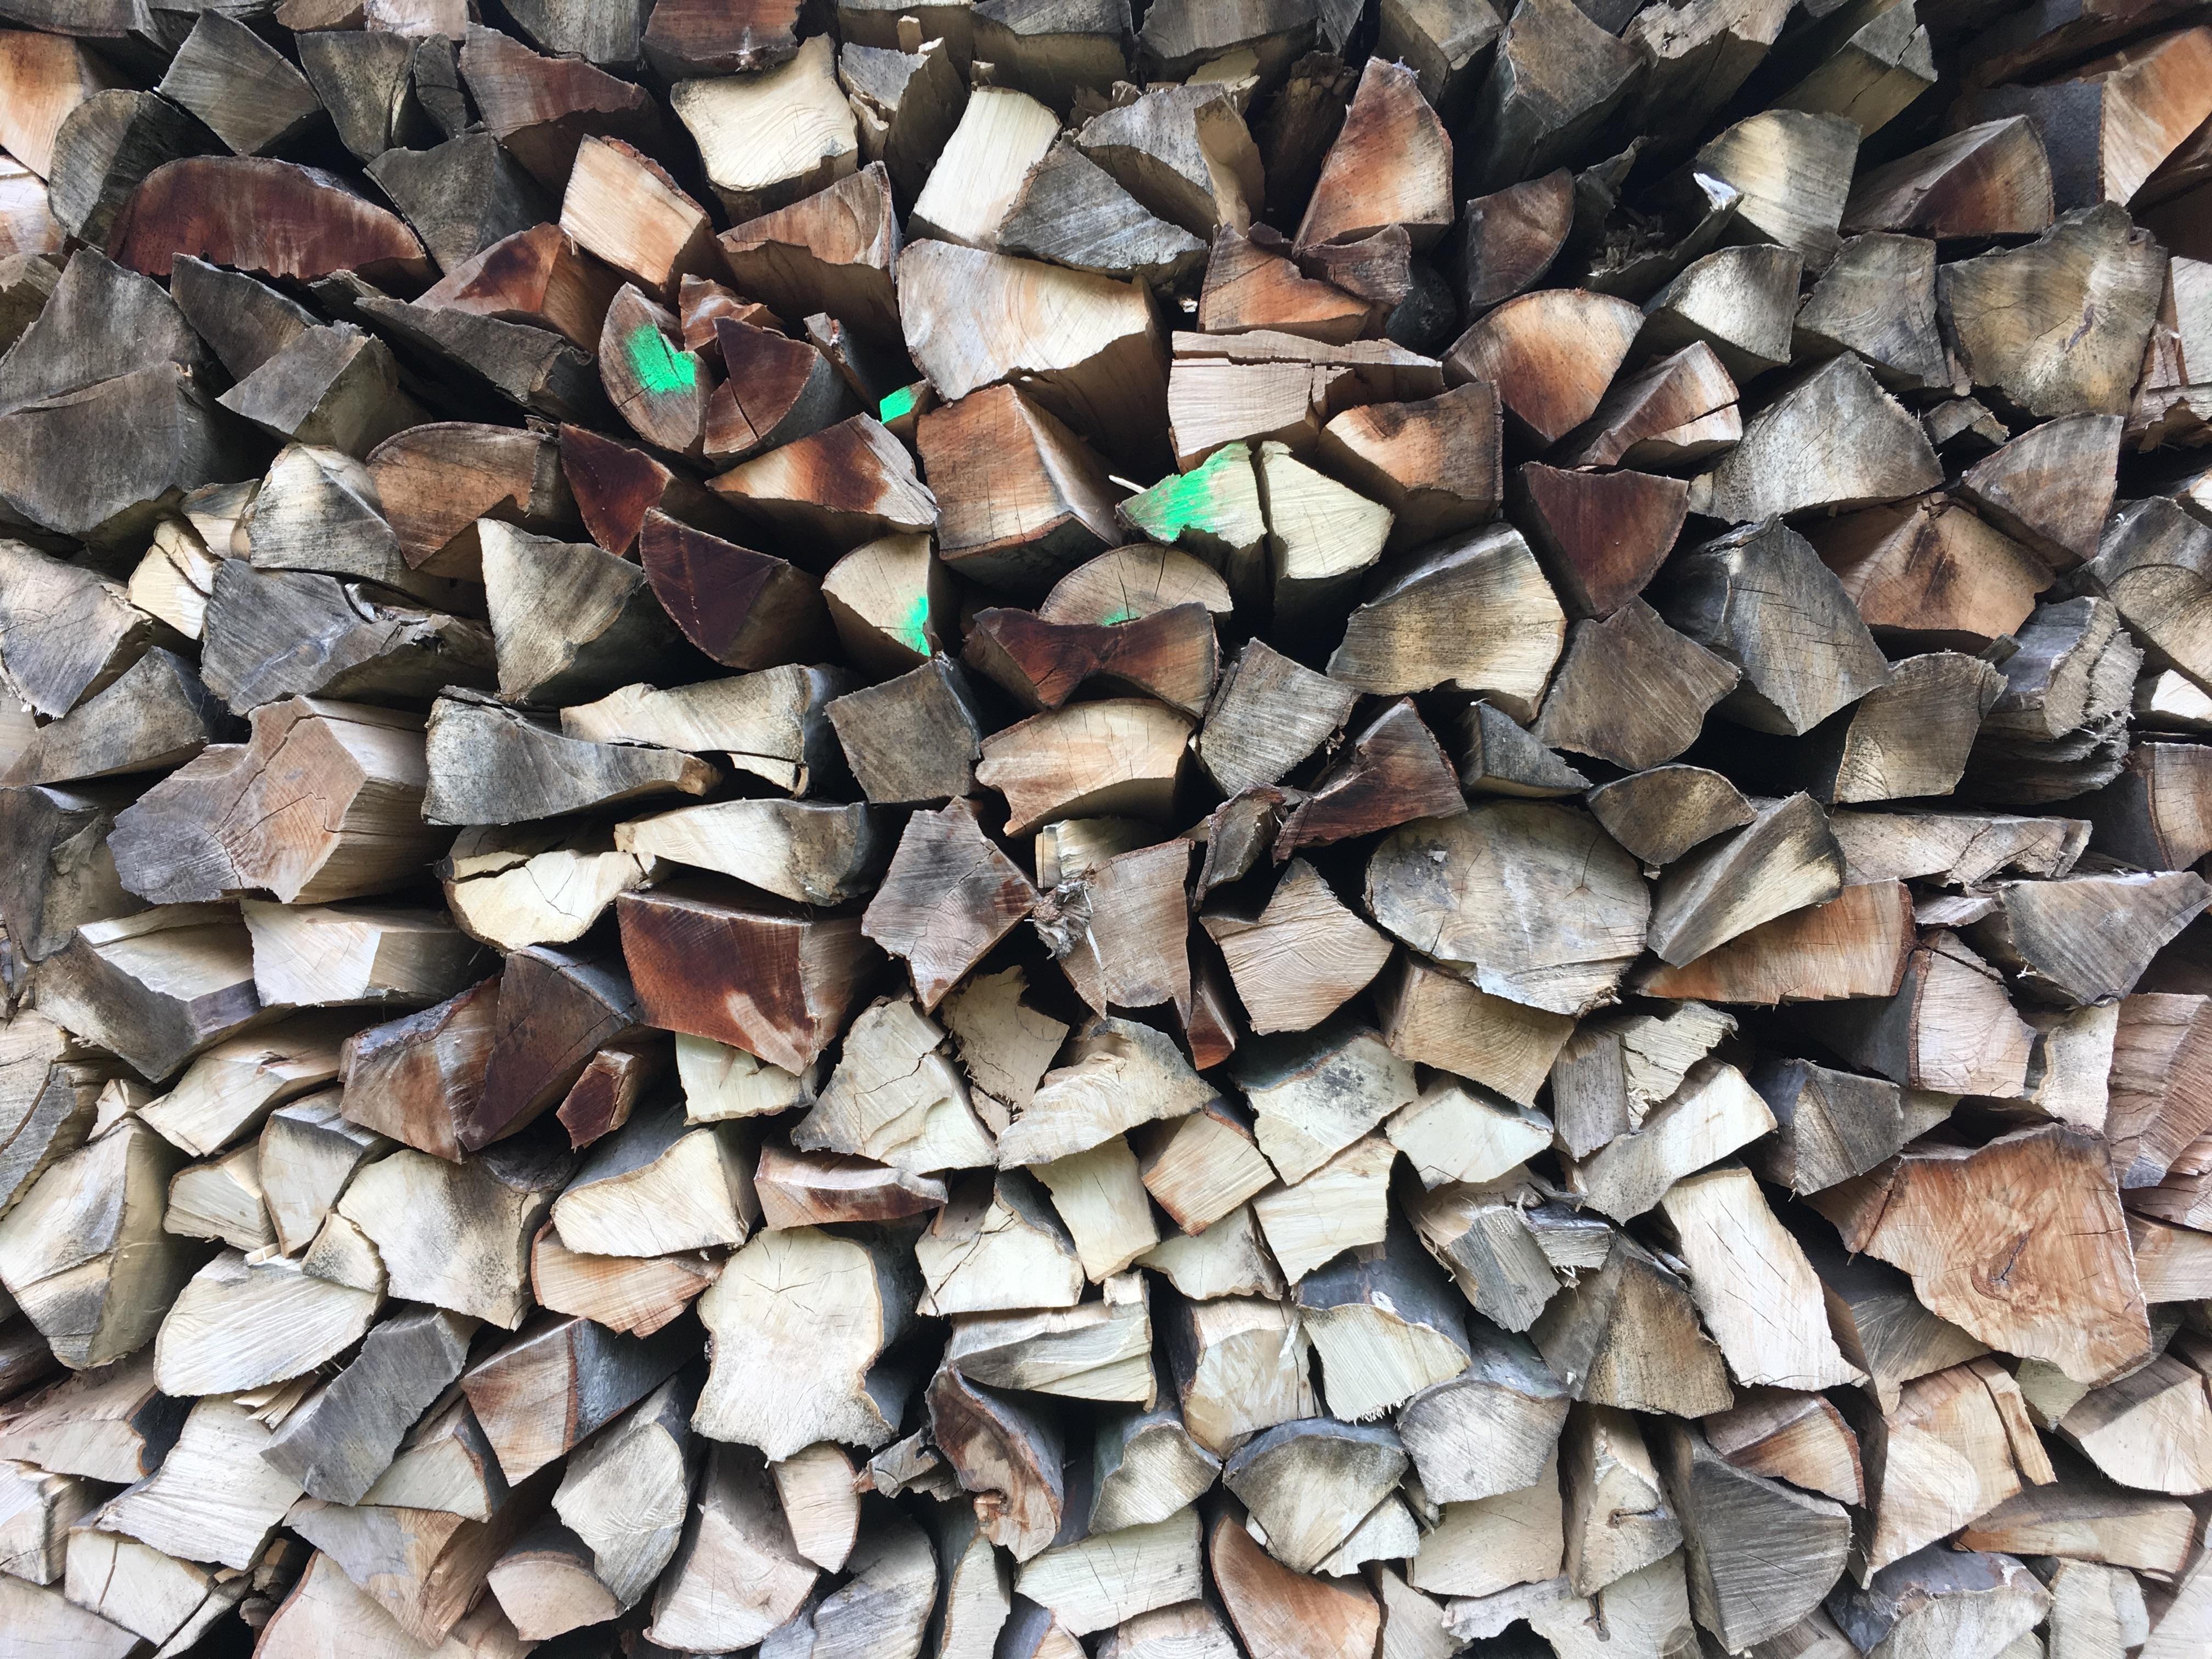 Pile of woods | Free Stock Photo